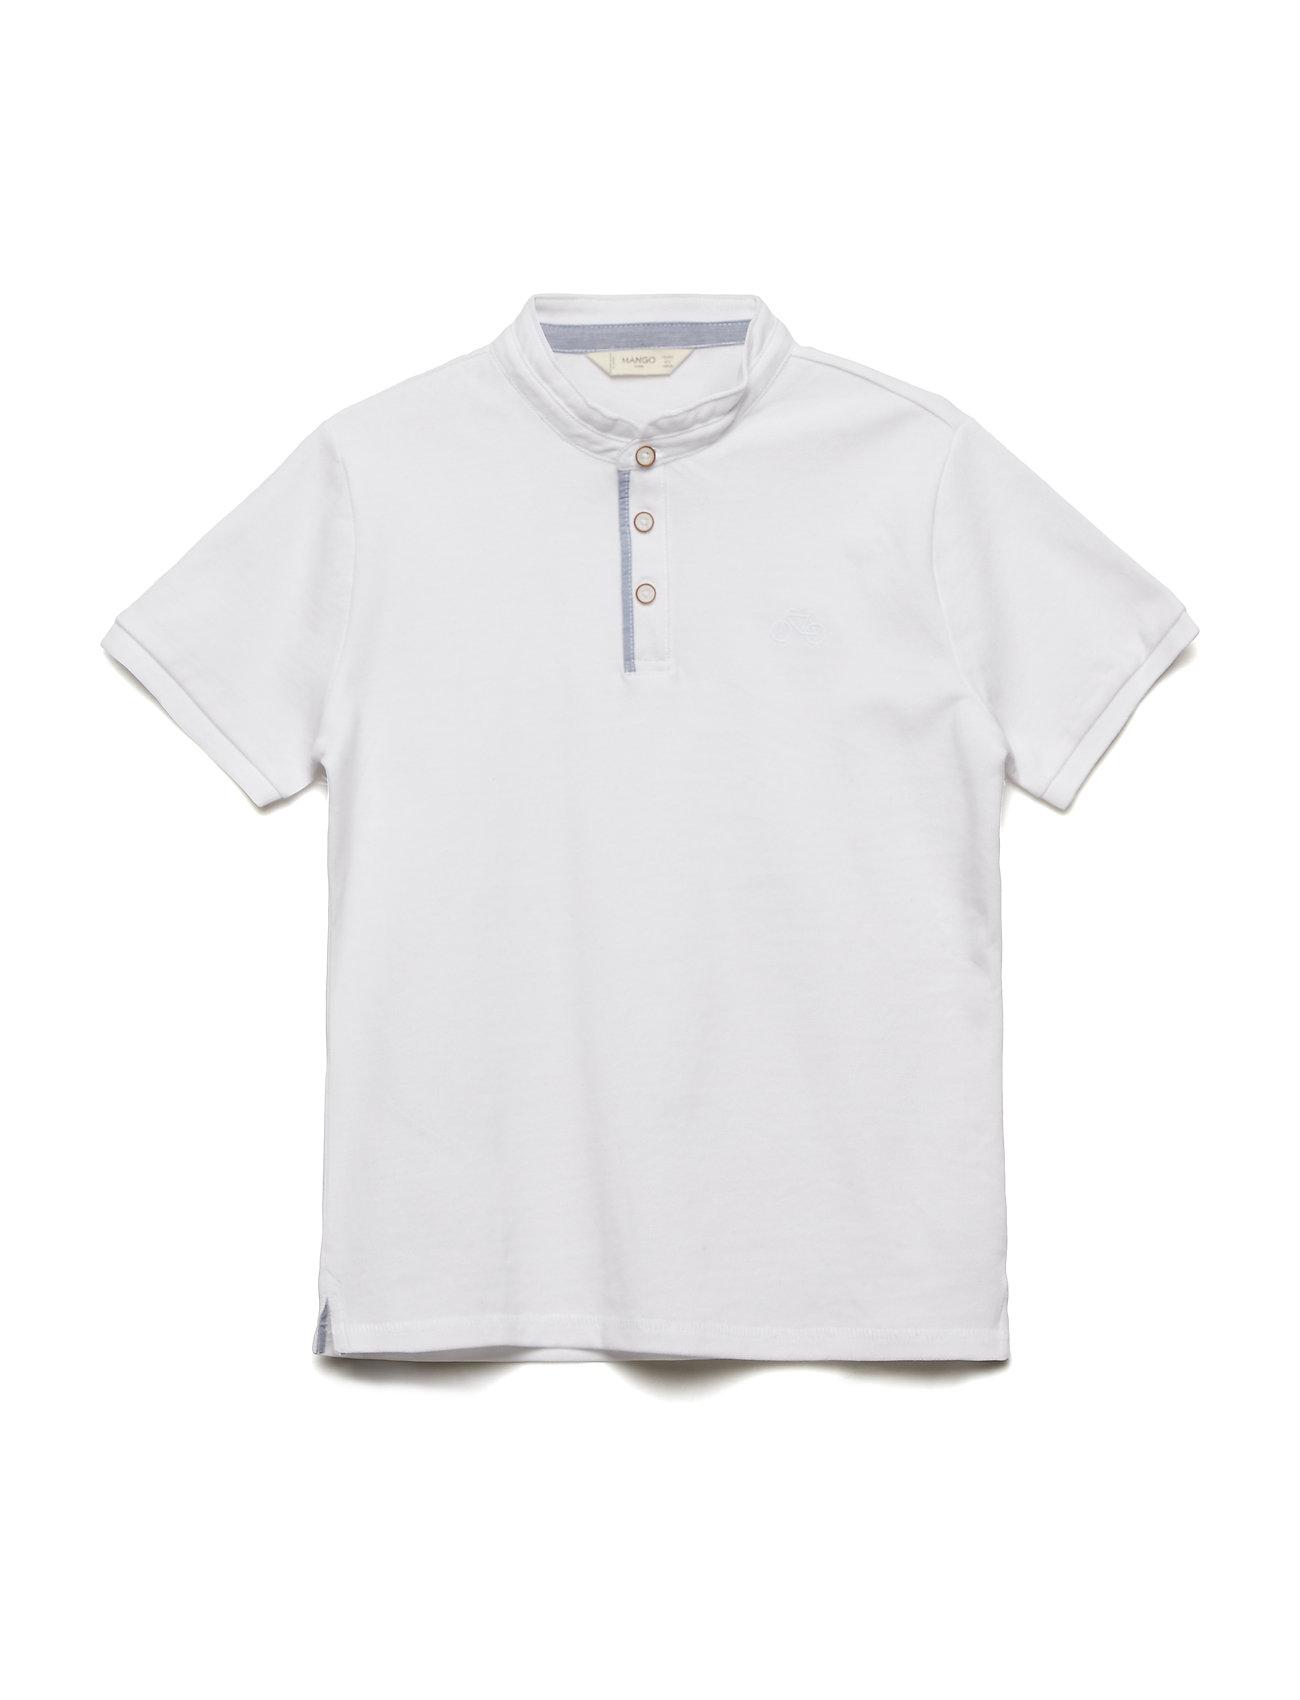 Image of Contrast-Edge Piqu Polo Shirt T-shirt Polo Hvid MANGO KIDS (3113431097)